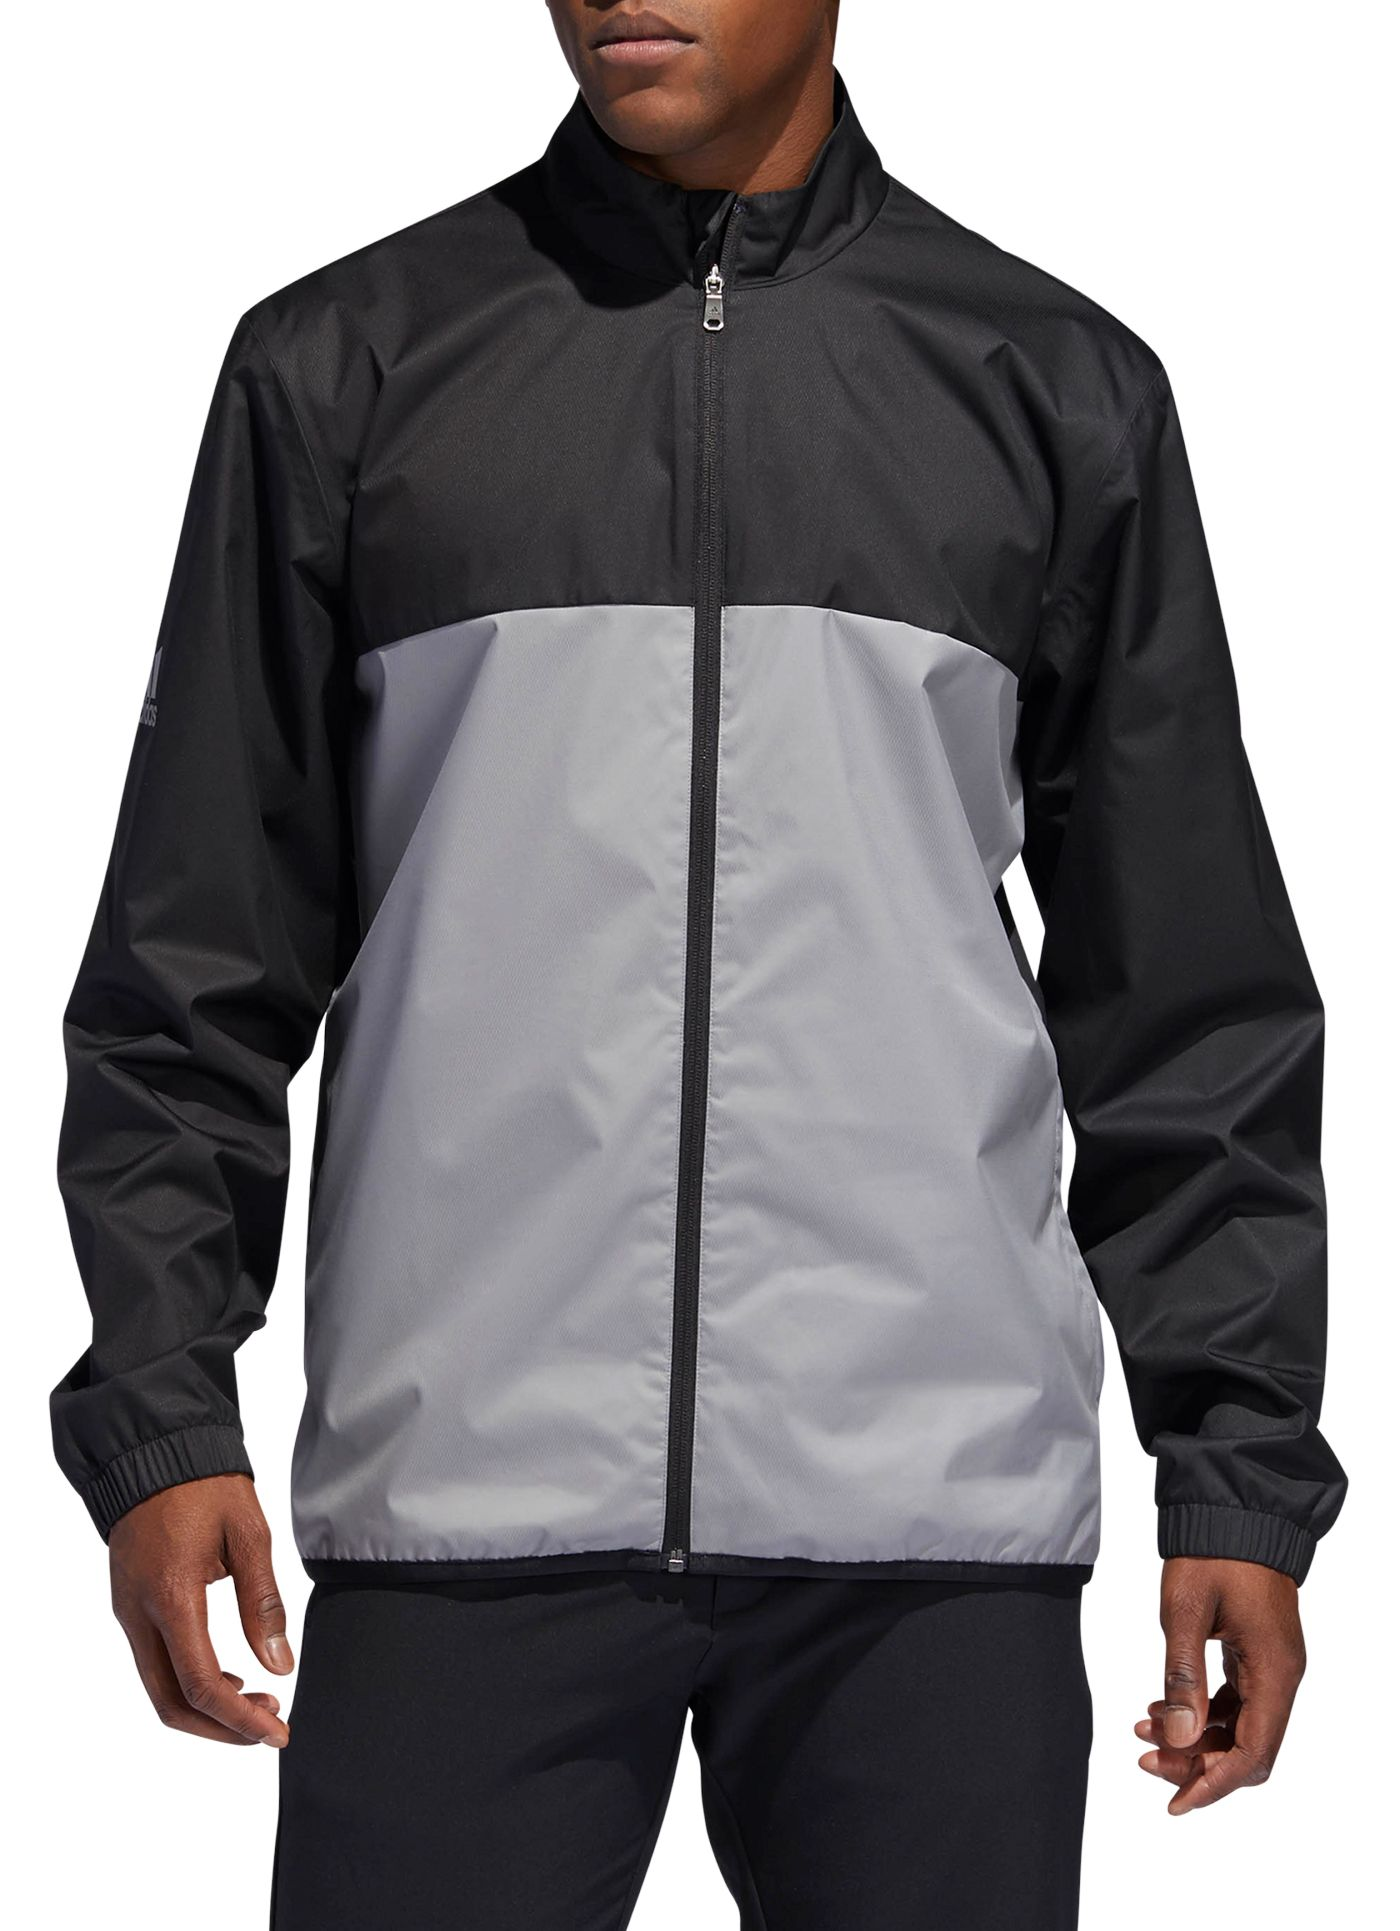 adidas Men's Climastorm Provisional Golf Rain Jacket